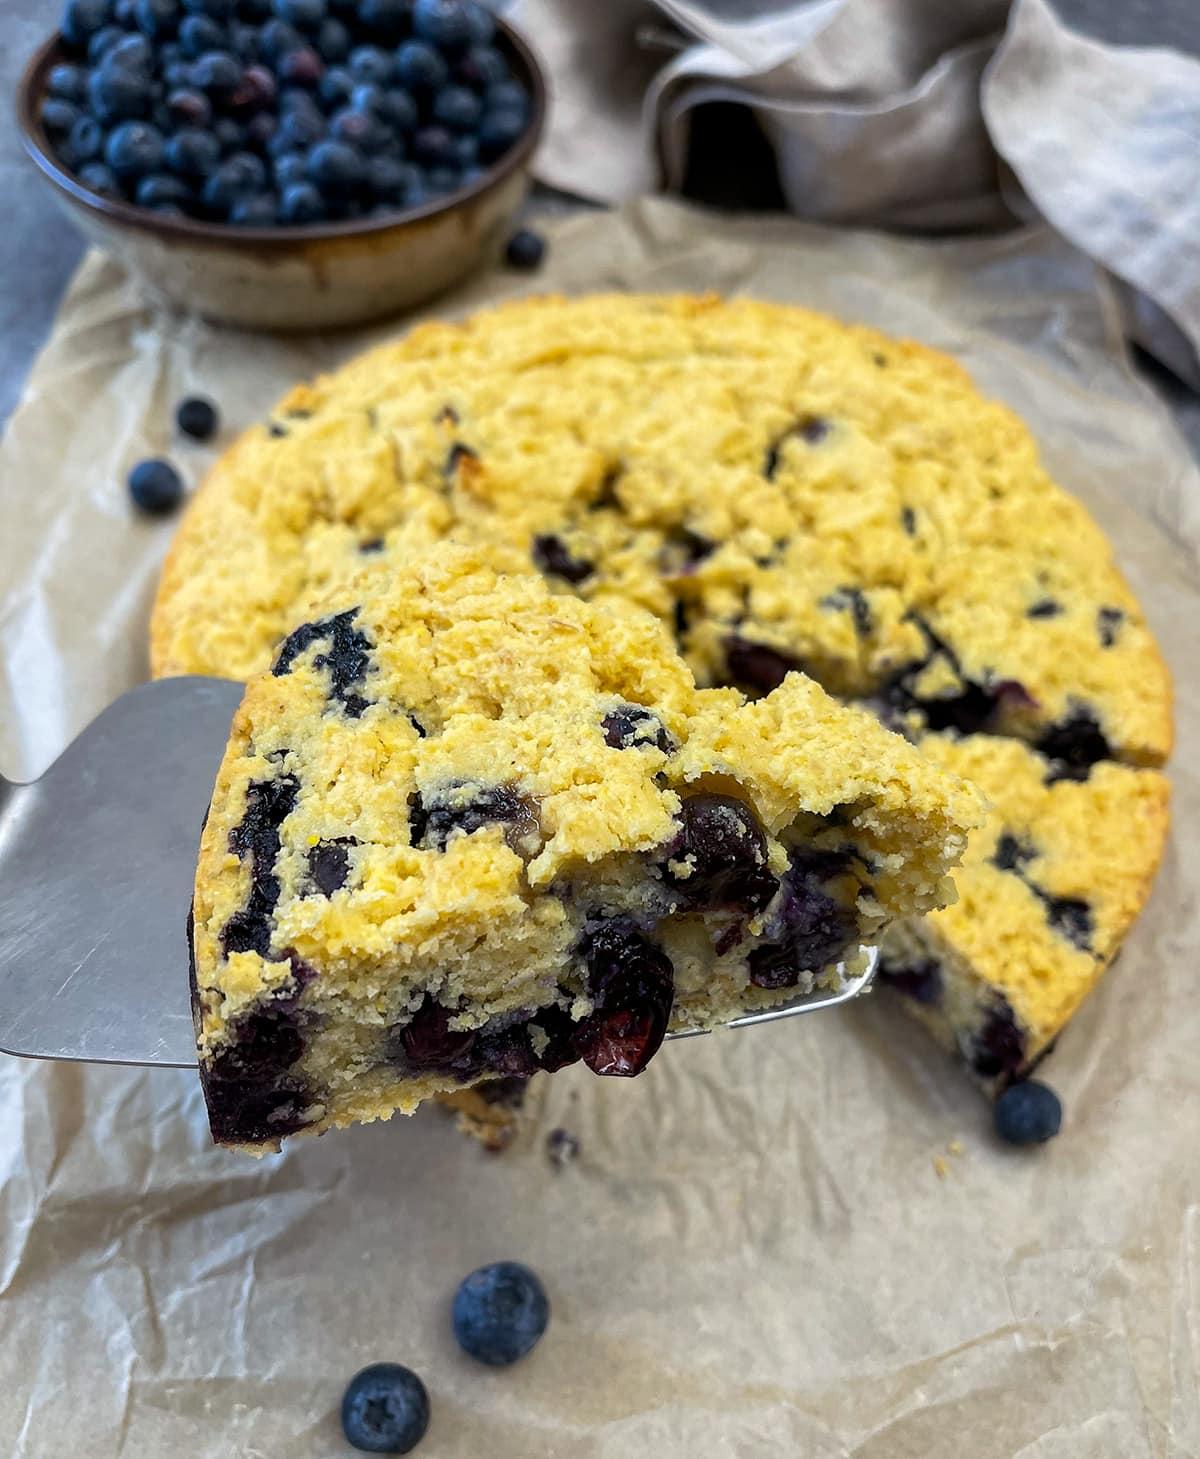 close up of blueberry cornbread, a slice on a server